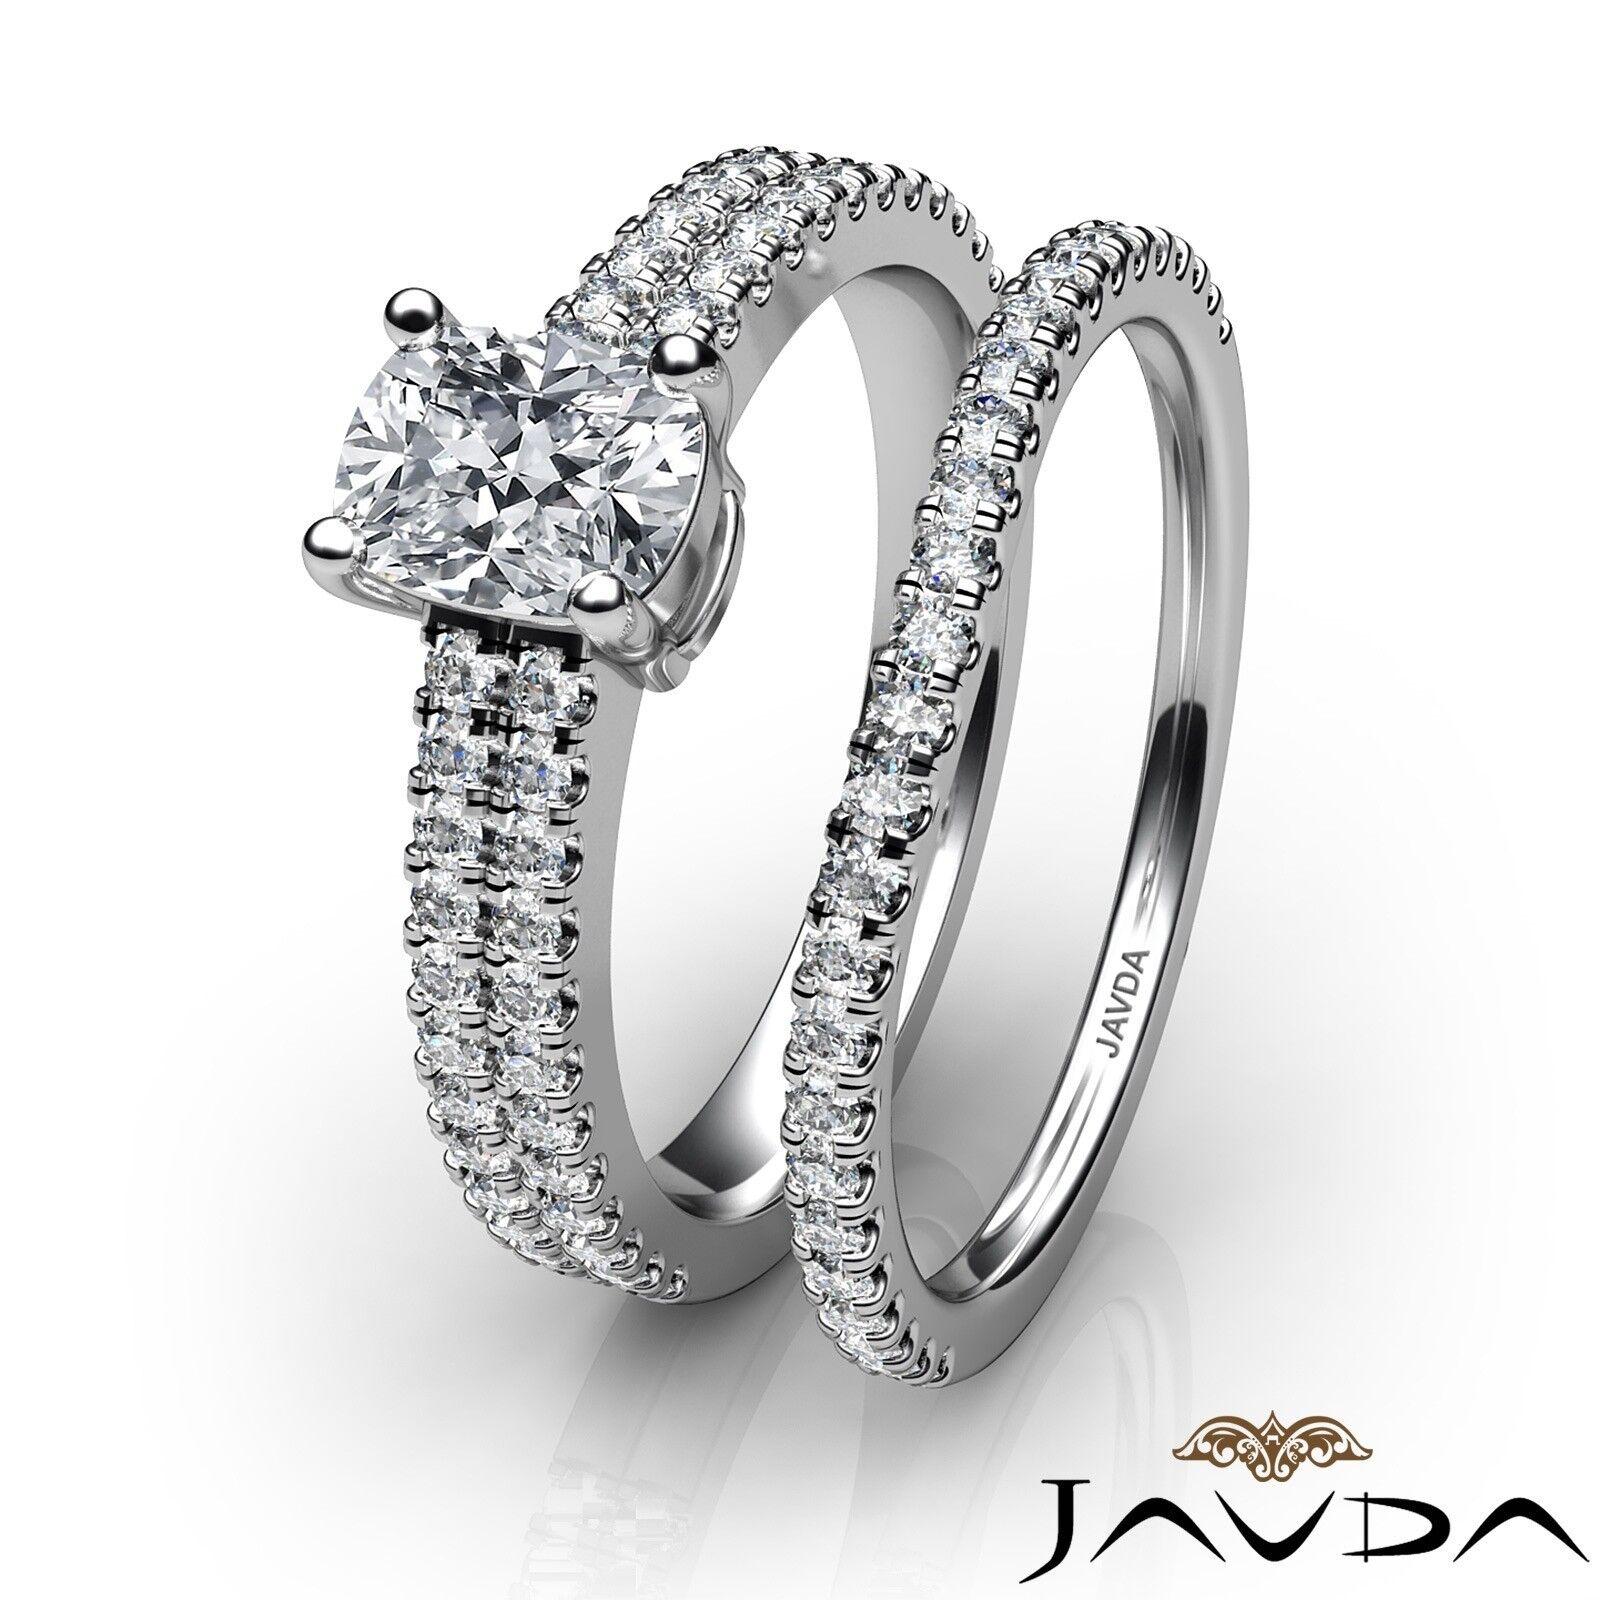 1.8ctw Bridal Scalloped Pave Cushion Diamond Engagement Ring GIA F-VVS2 W Gold 3